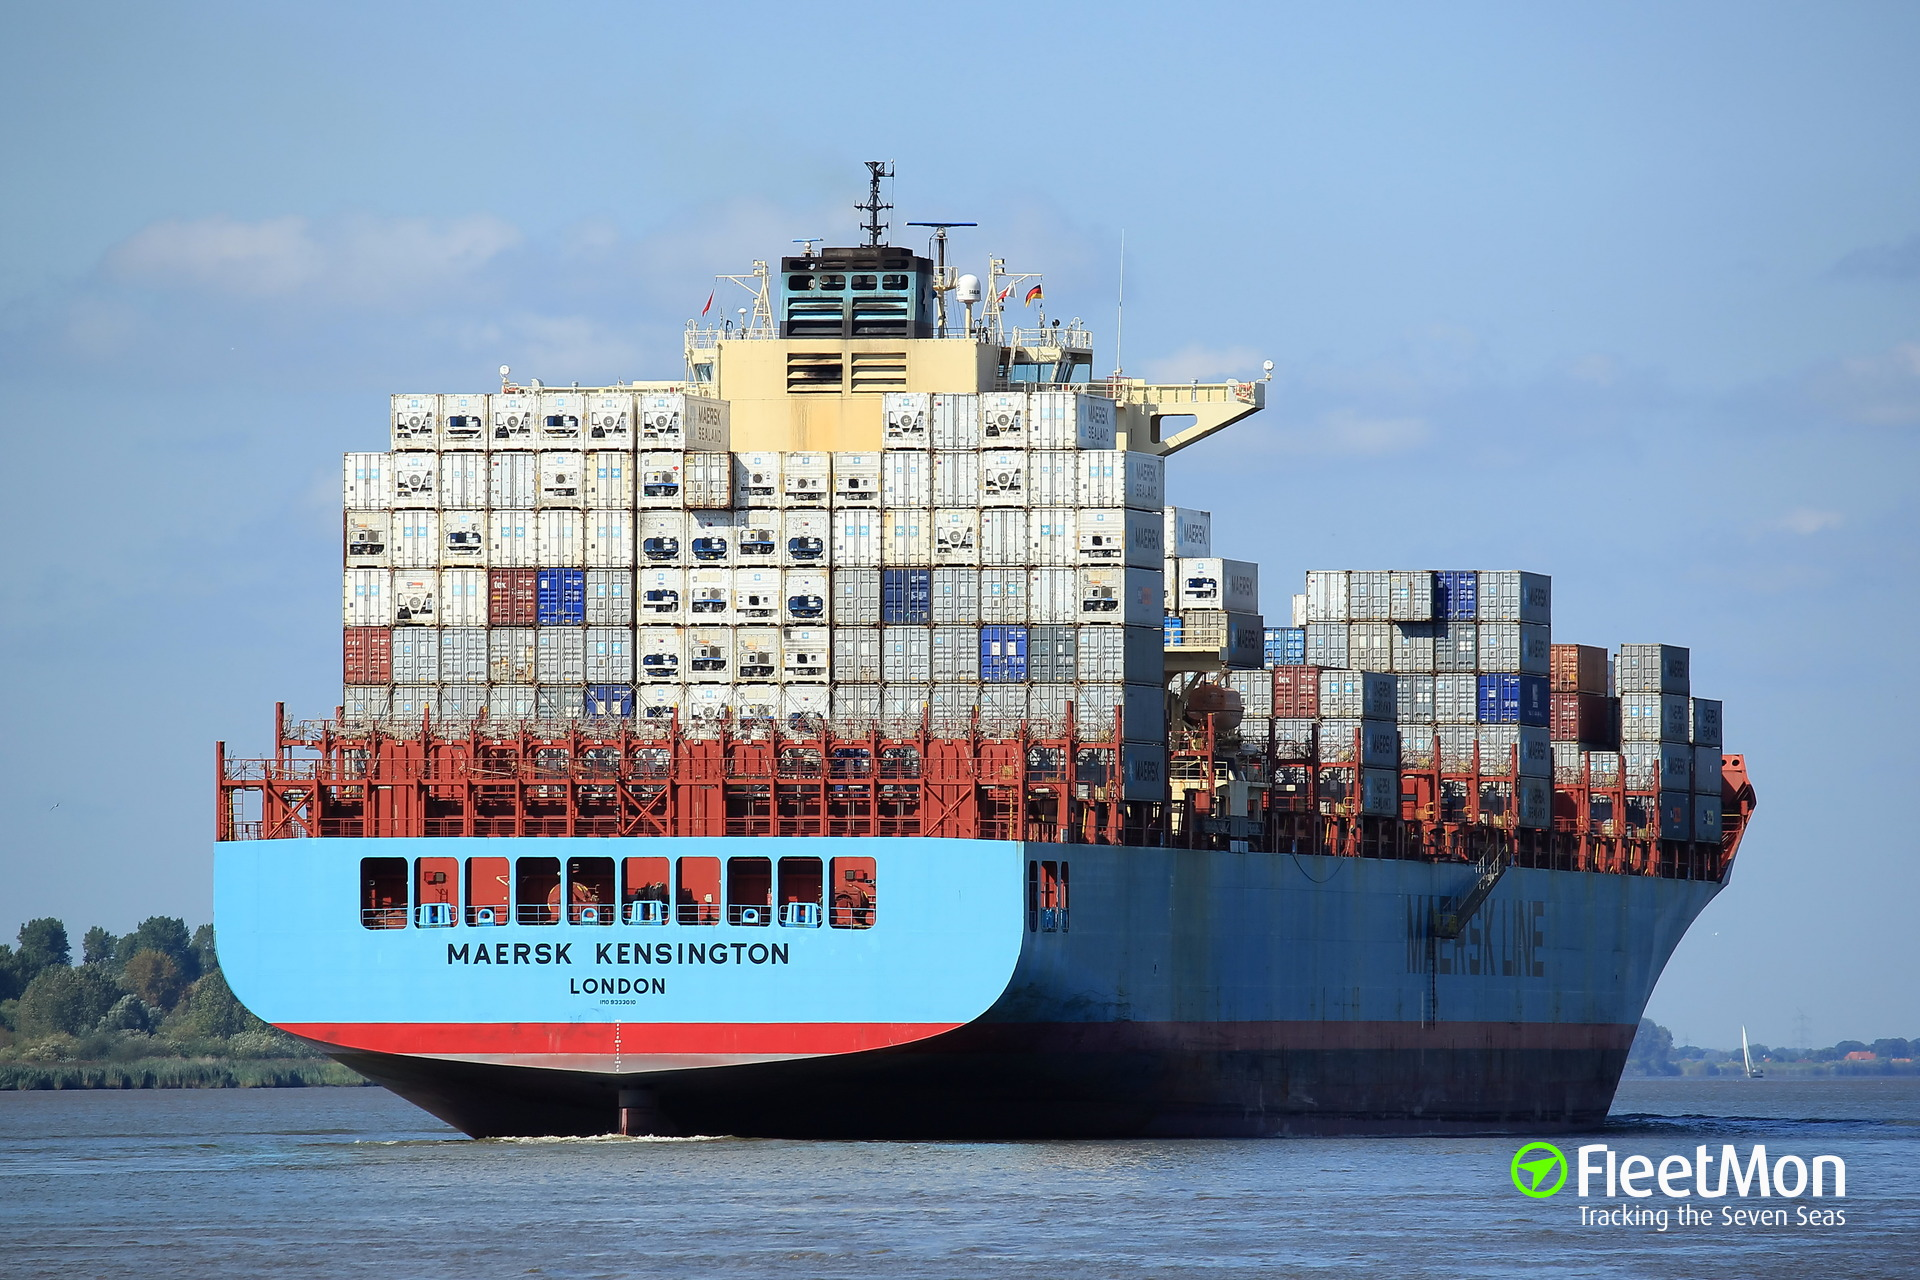 New Maersk